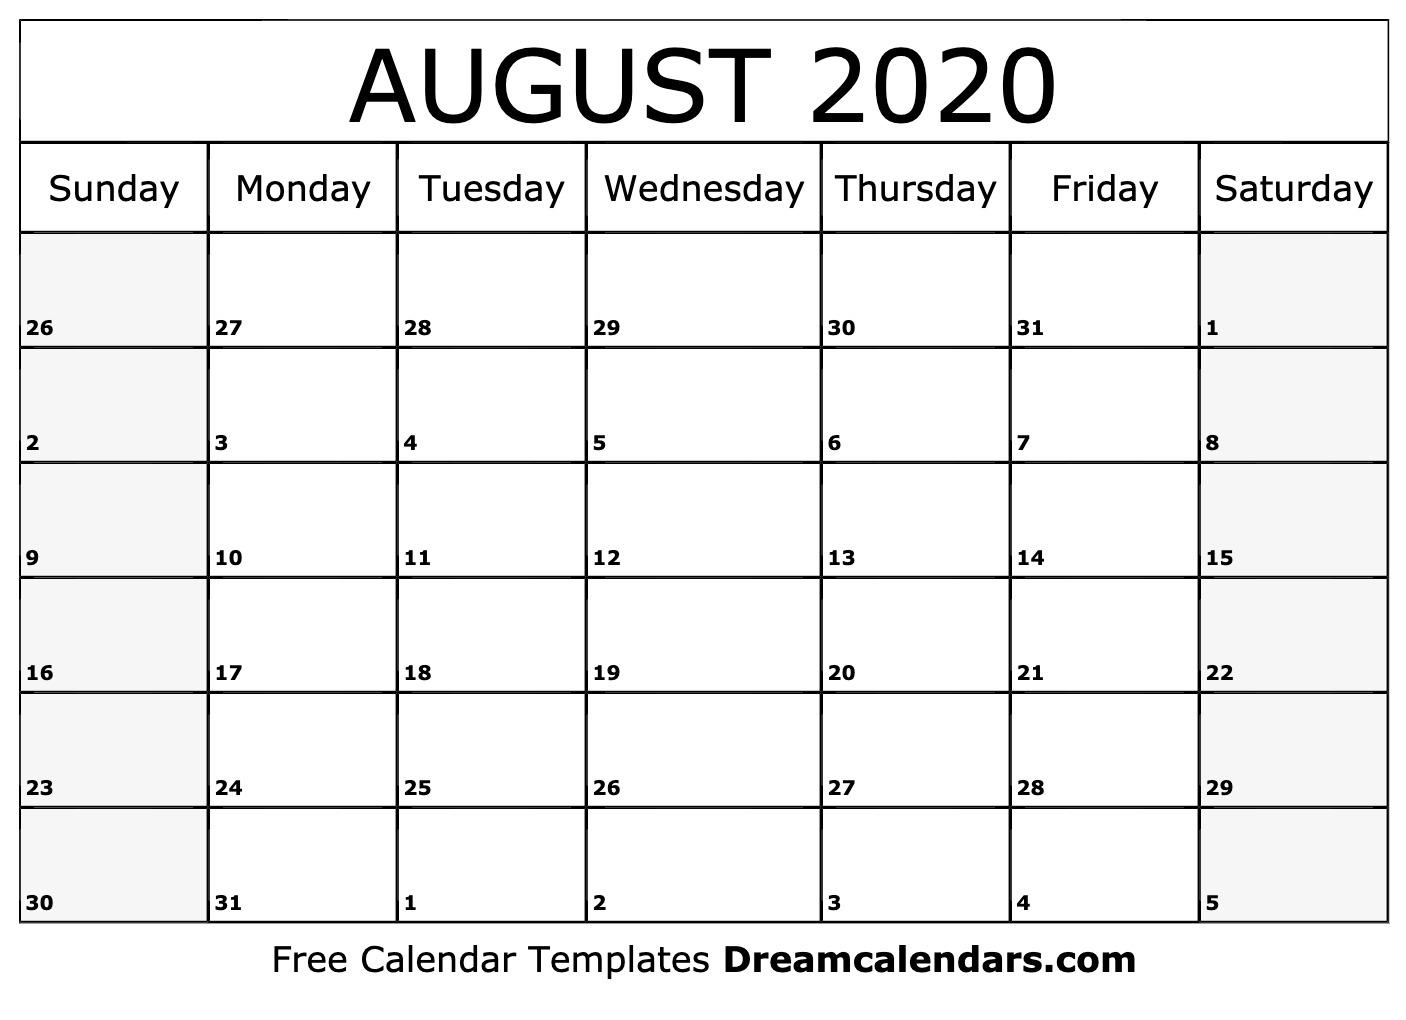 Printable August 2020 Calendar intended for June July August 2020 Calendar